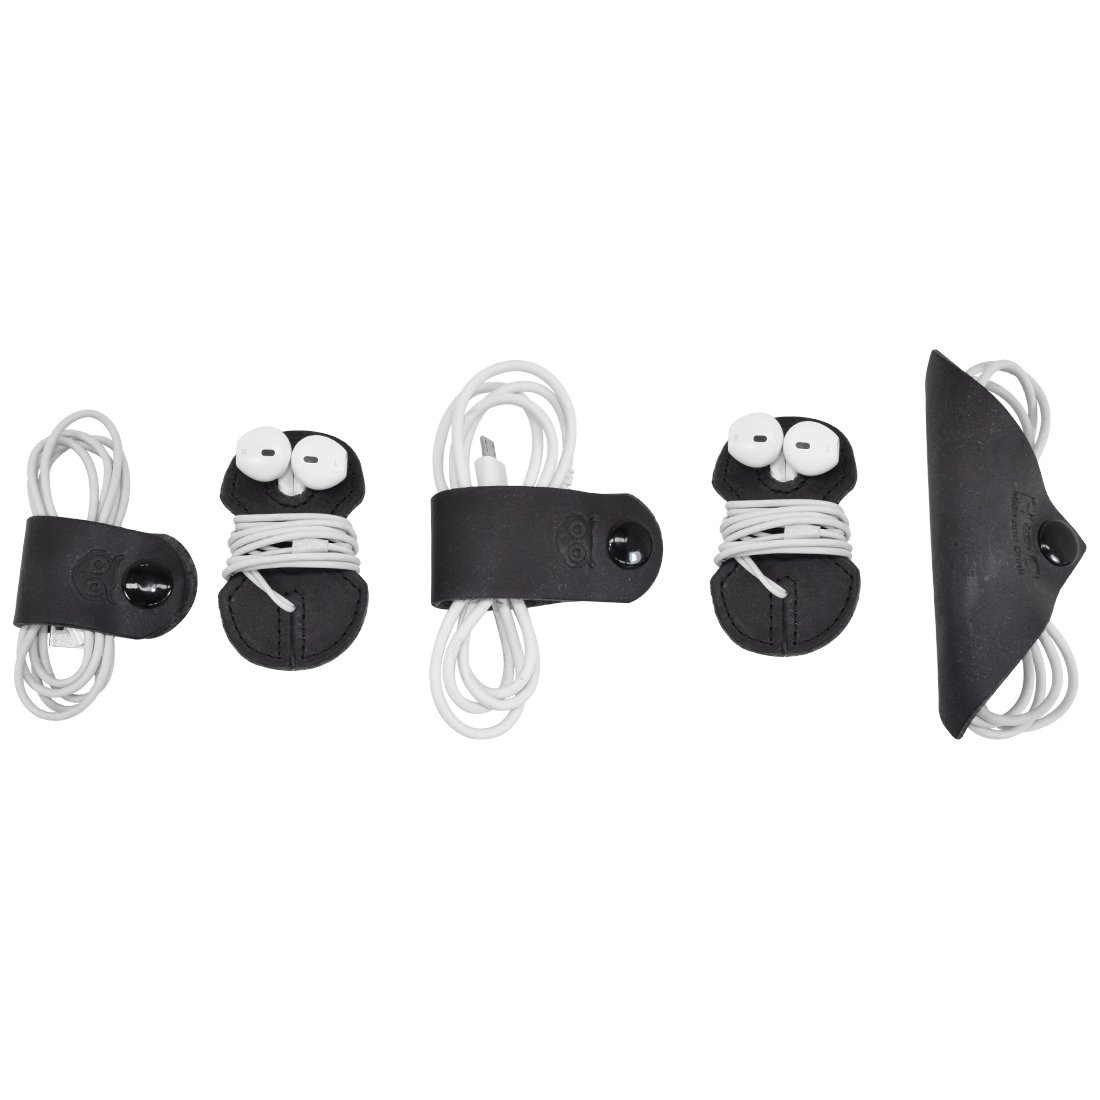 Cord Keeper (Cord Clam) 5-Pack Handmade by Hide & Drink :: Black